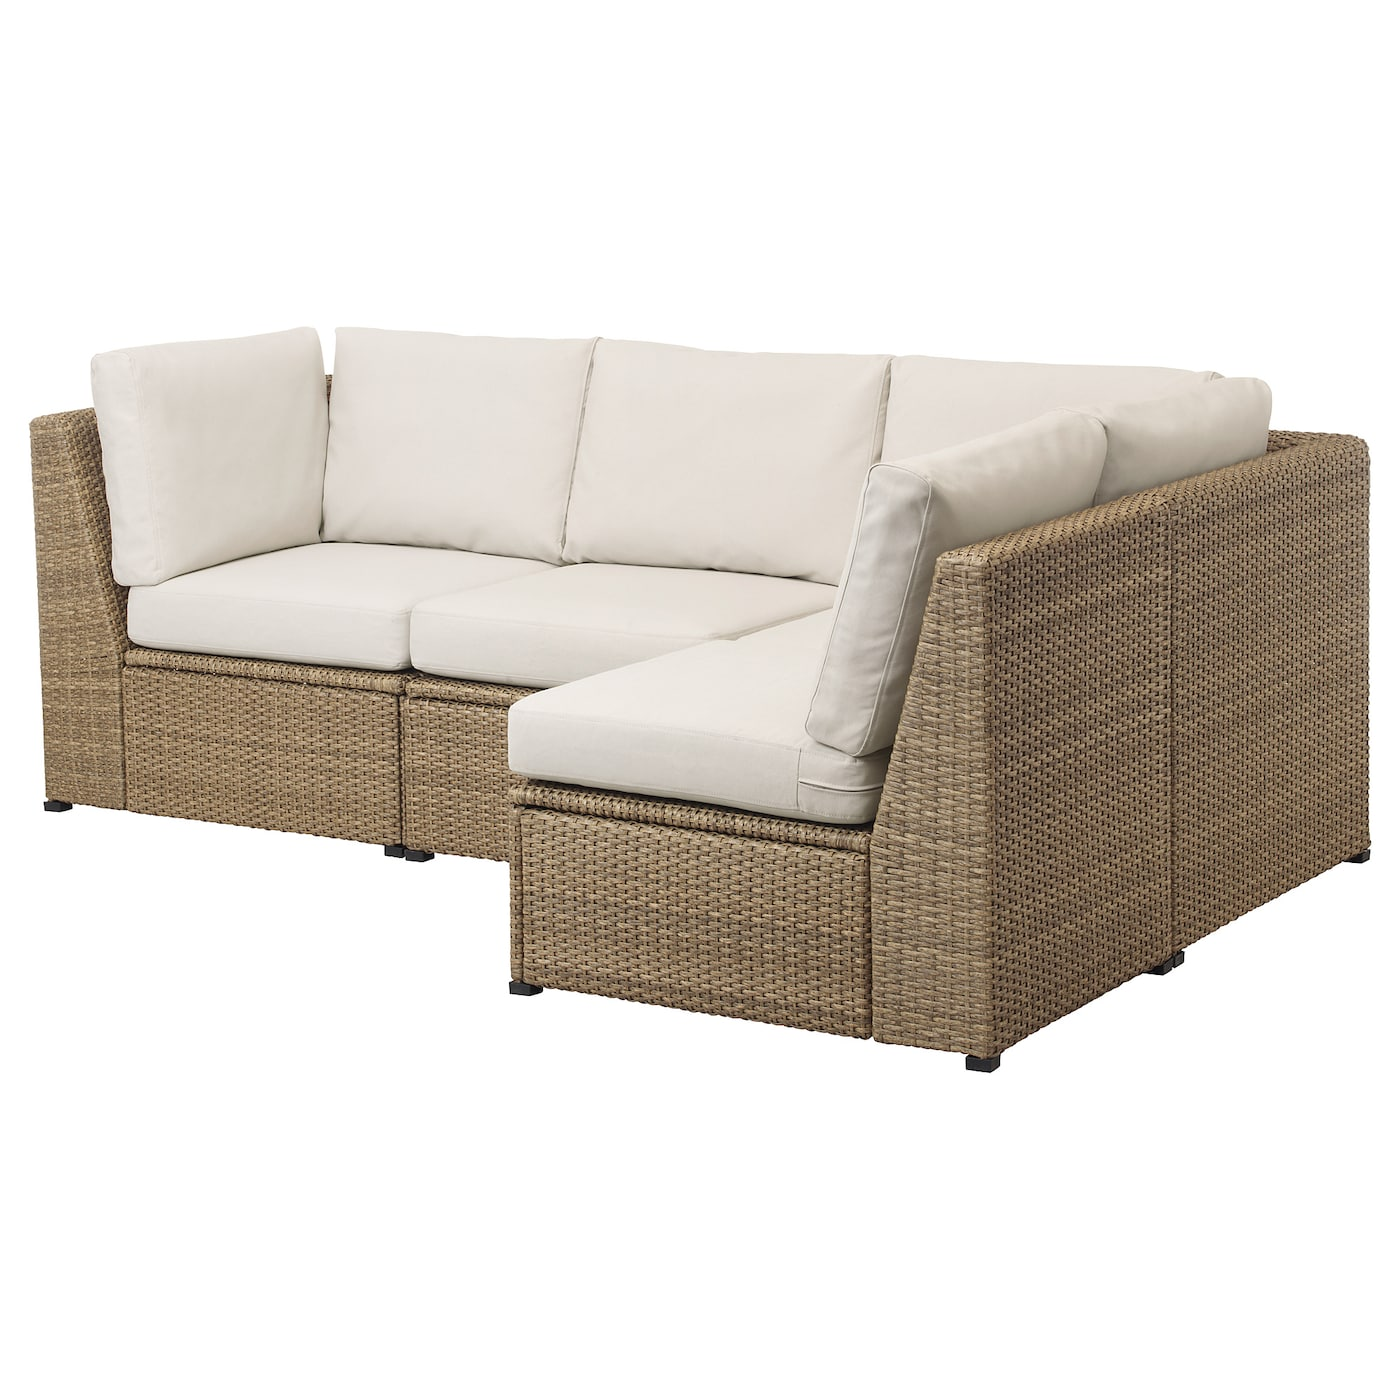 Modular Corner Sofa 3 Seat Outdoor